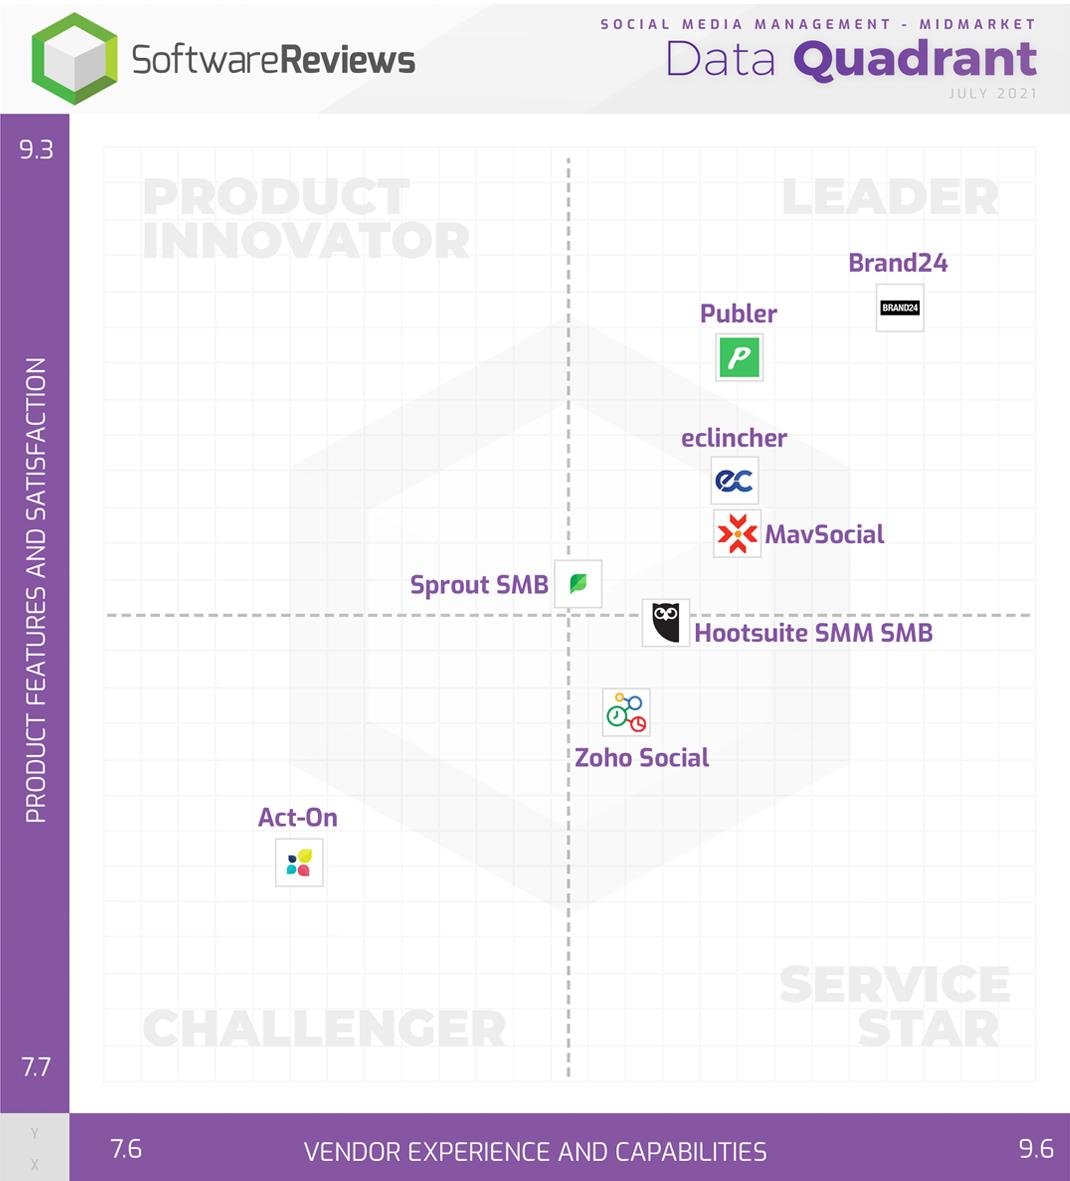 Social Media Management - Midmarket Data Quadrant